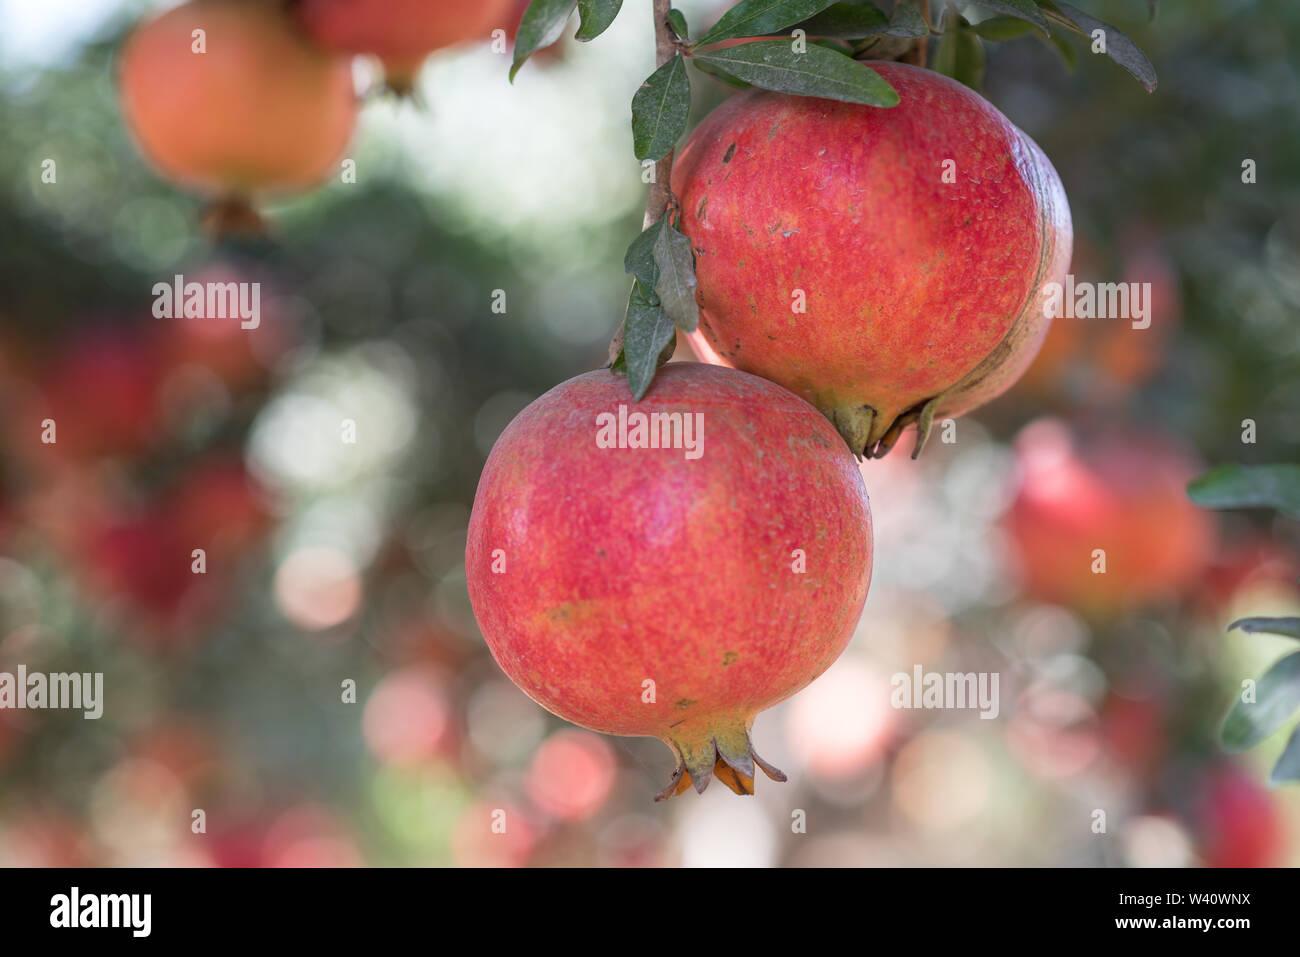 Ripe Colorful Pomegranate Fruit on Tree Branch.  Red pomegranate fruit on the tree in green leaves on blue sky background. - Stock Image